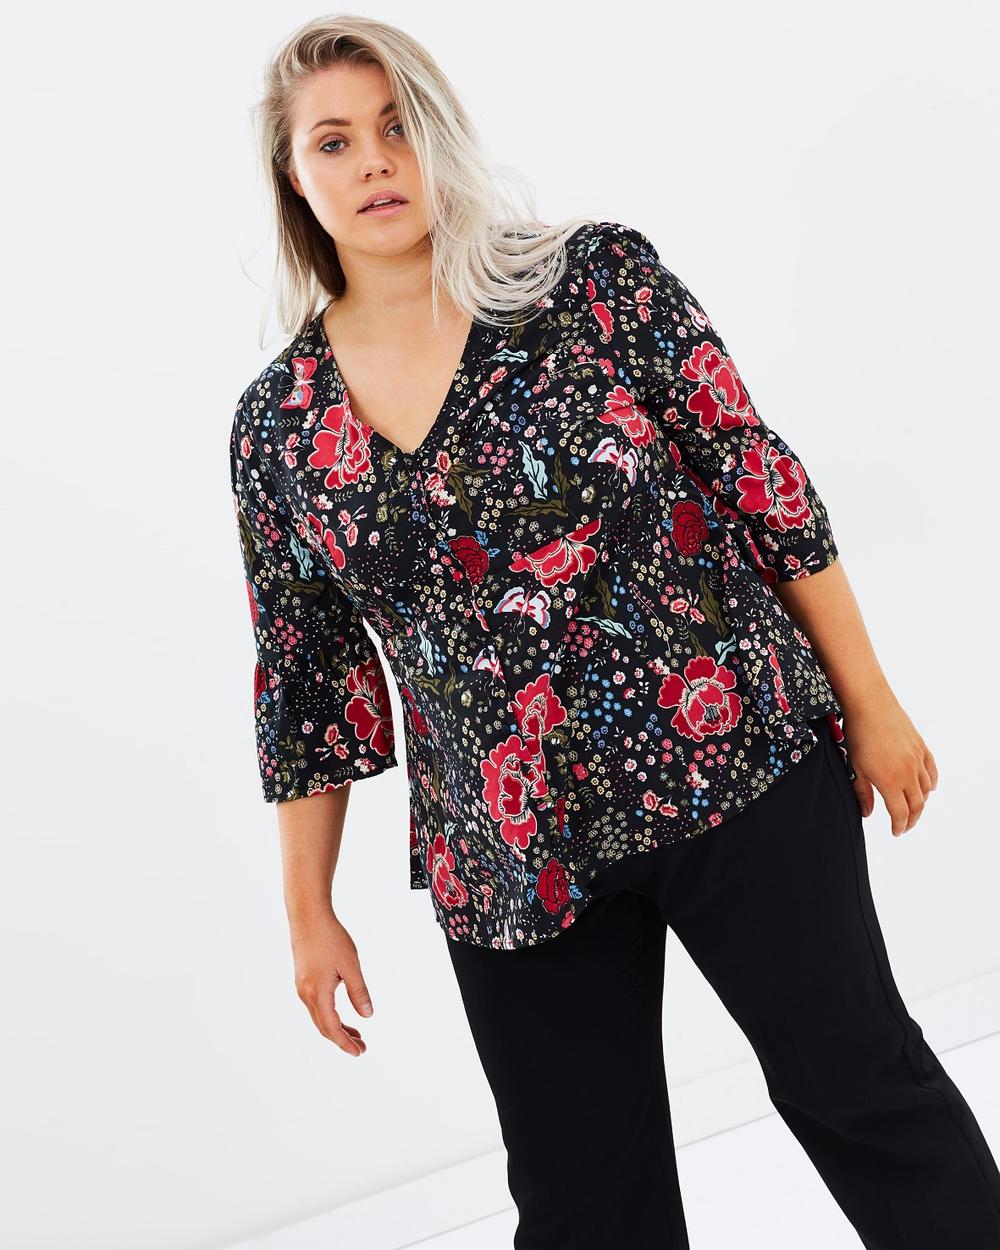 JUNAROSE Flowered 3 4 Sleeved Blouse Tops Black Beauty Flowered 3-4 Sleeved Blouse